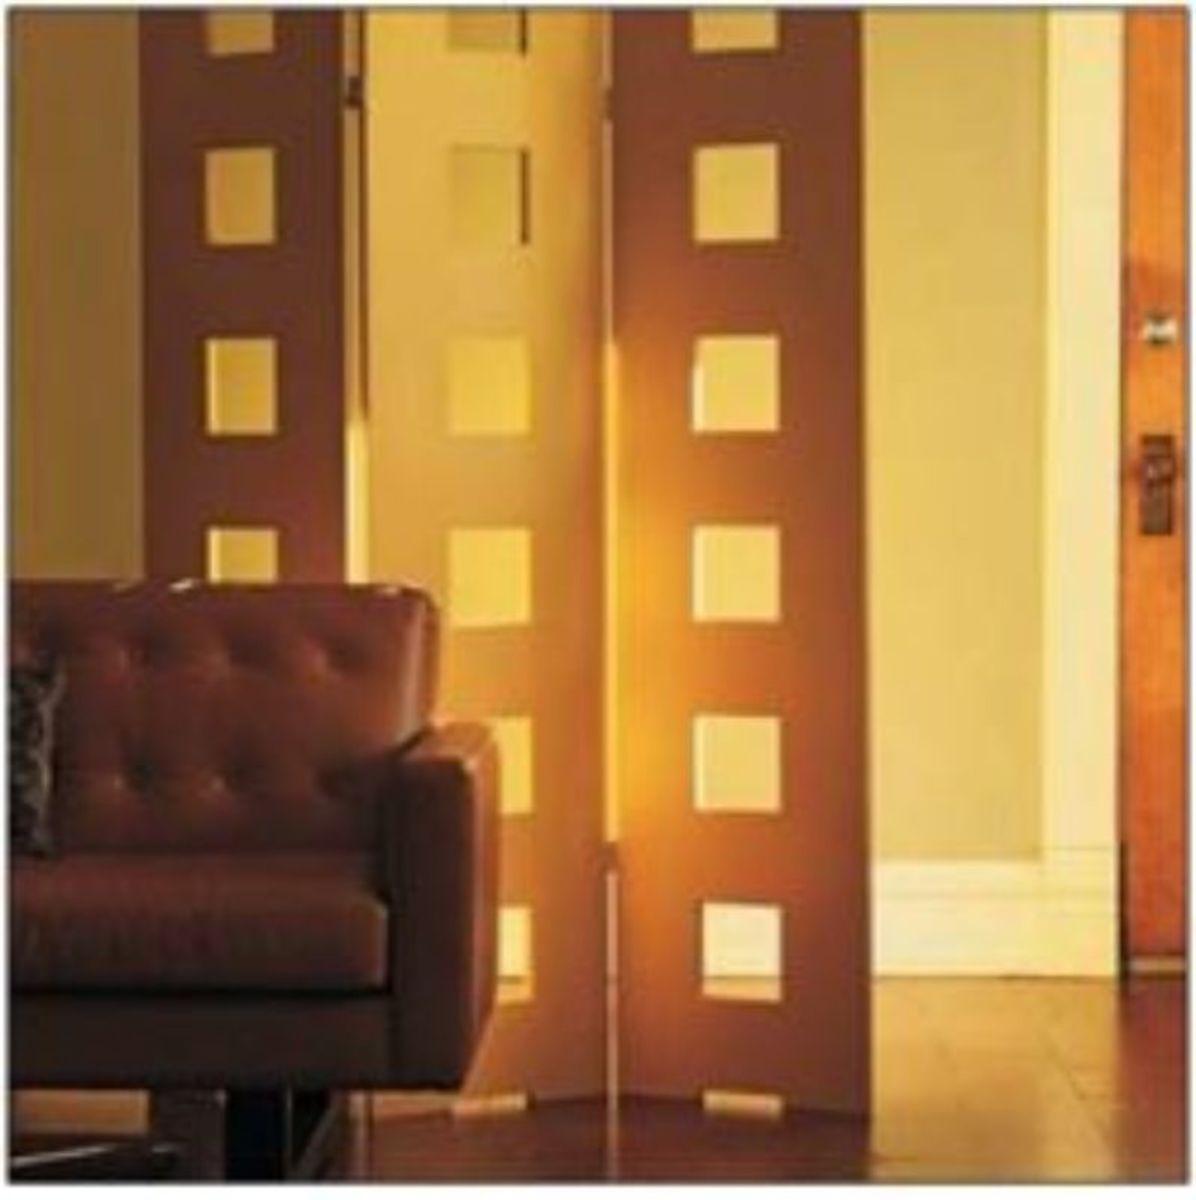 Wooden Room Divider via WorkBenchMagazine.com